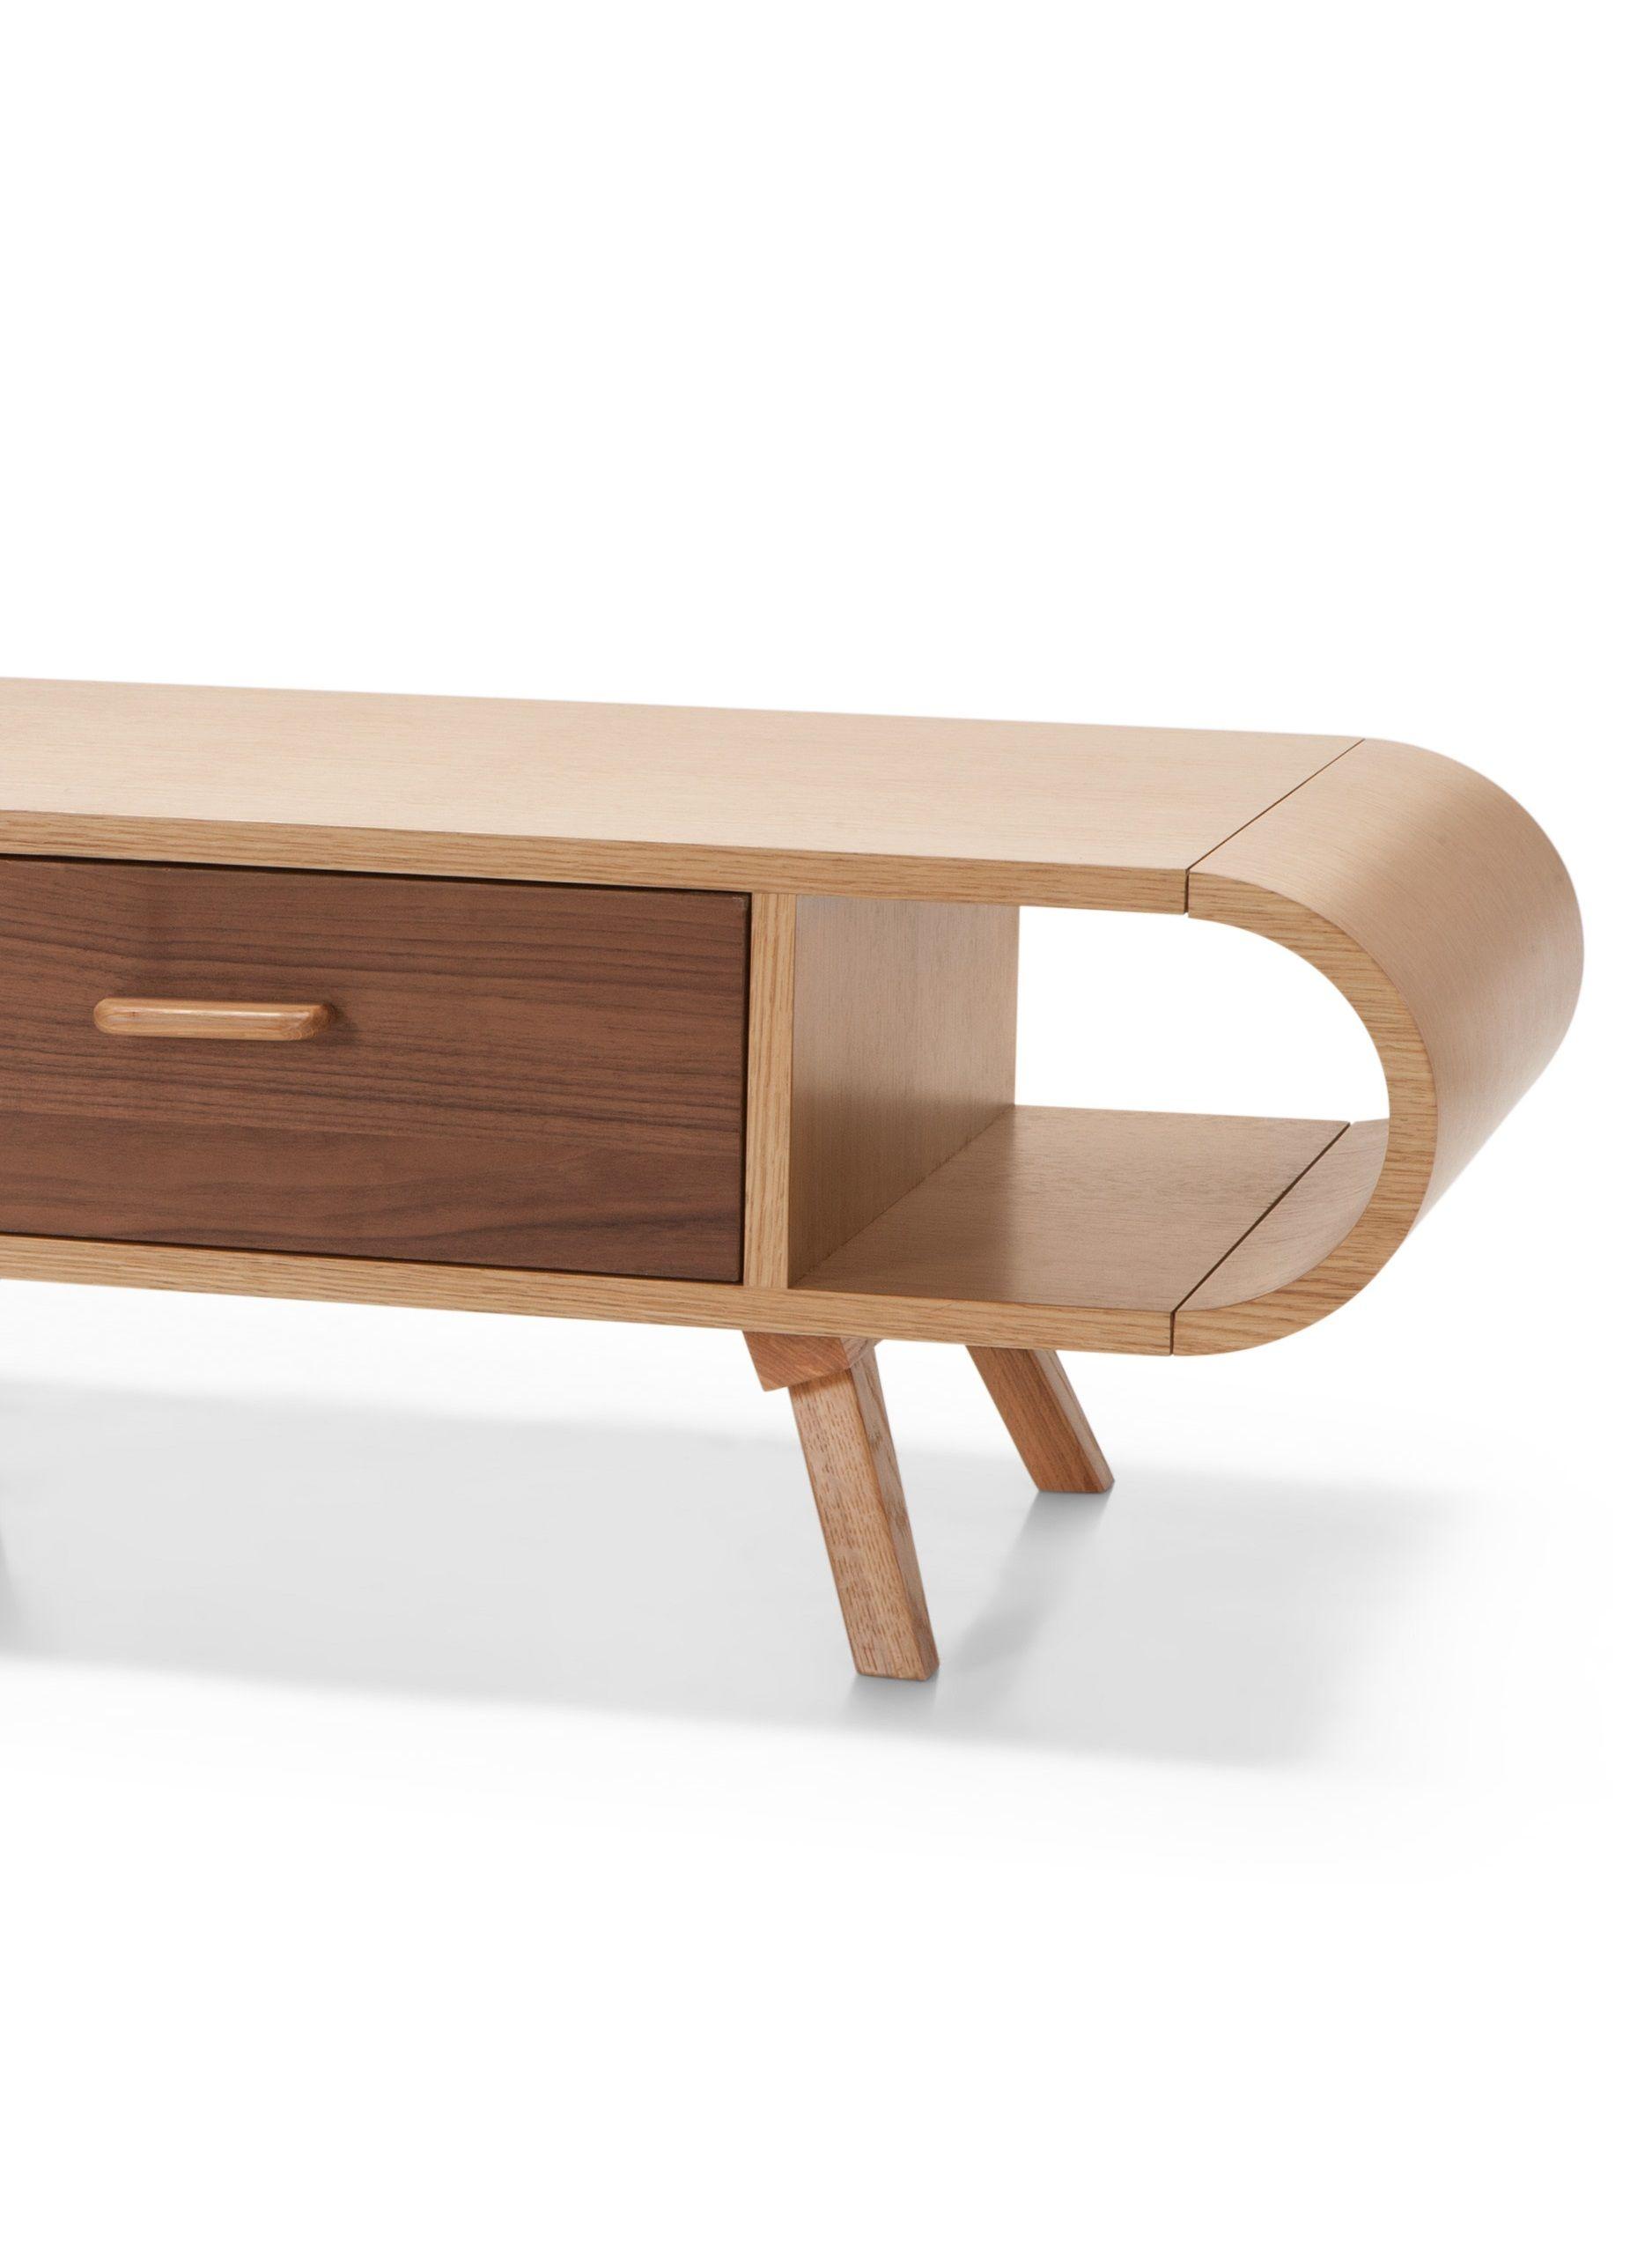 The Fonteyn Coffee Table In Oak And Walnut A Practical